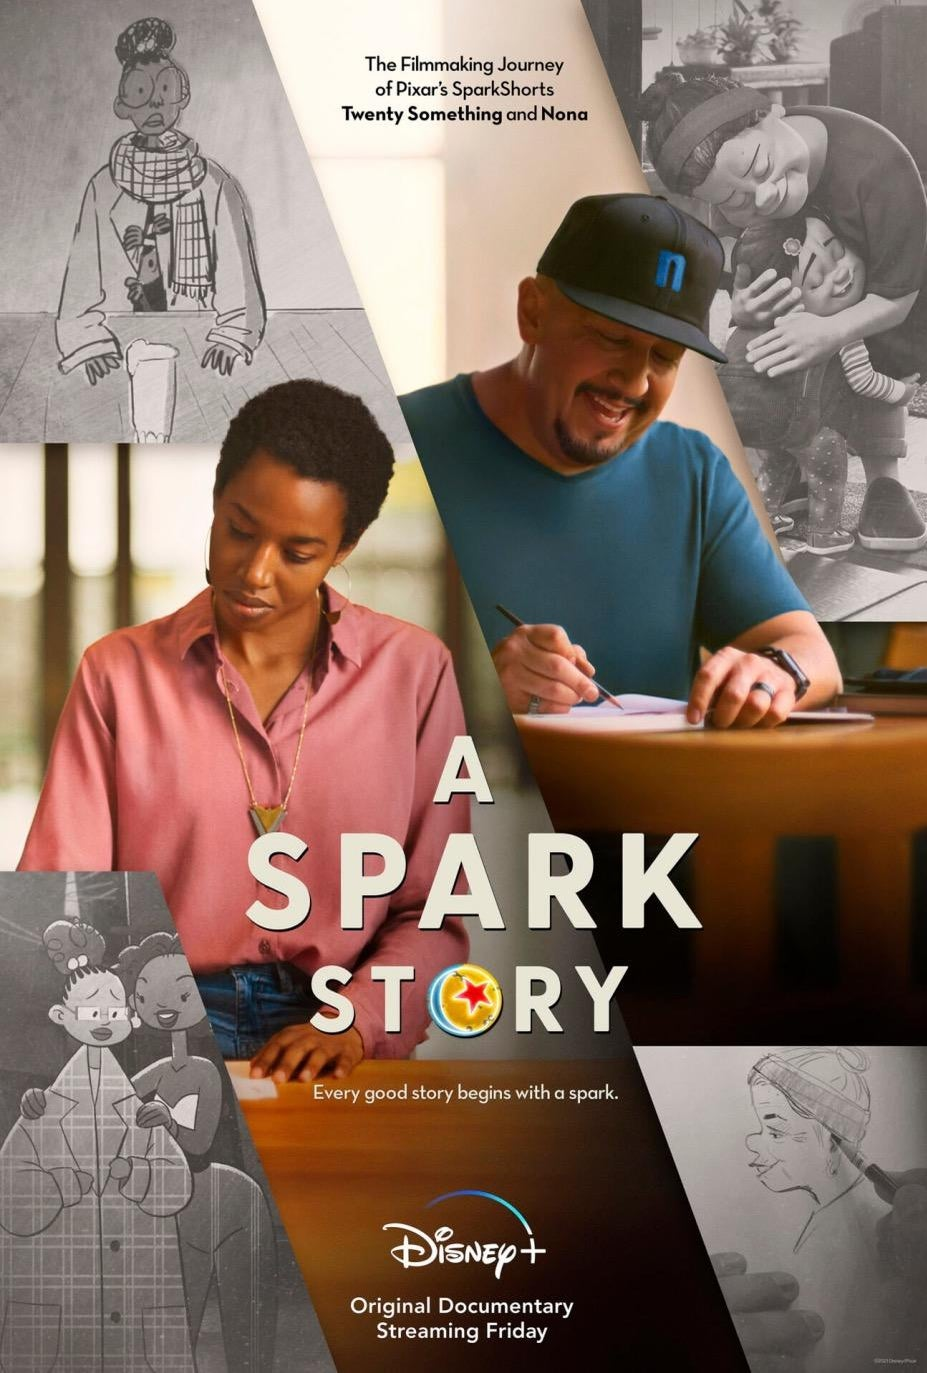 disney-pixar-a-spark-story-poster.jpg